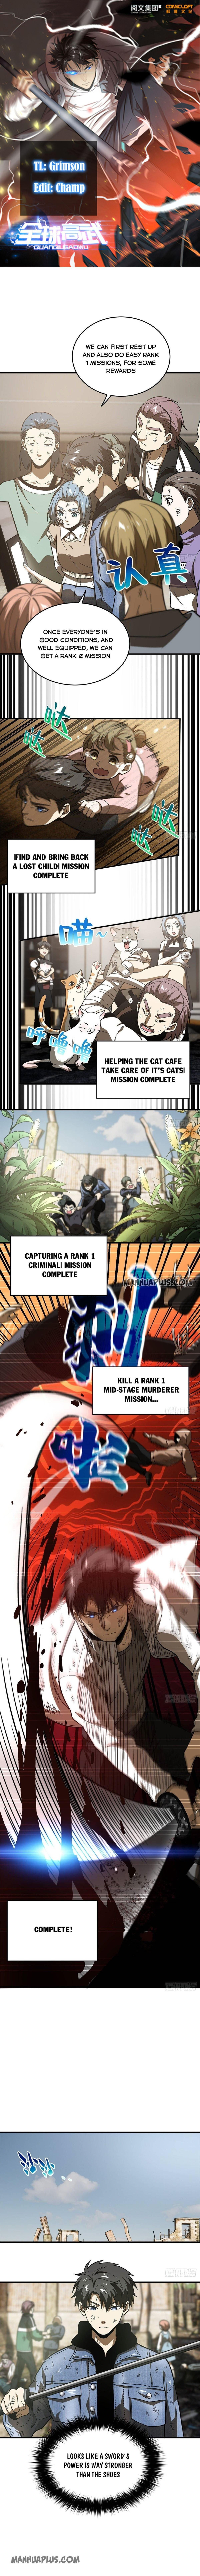 Manga Global Martial Arts - Chapter 69 Page 1